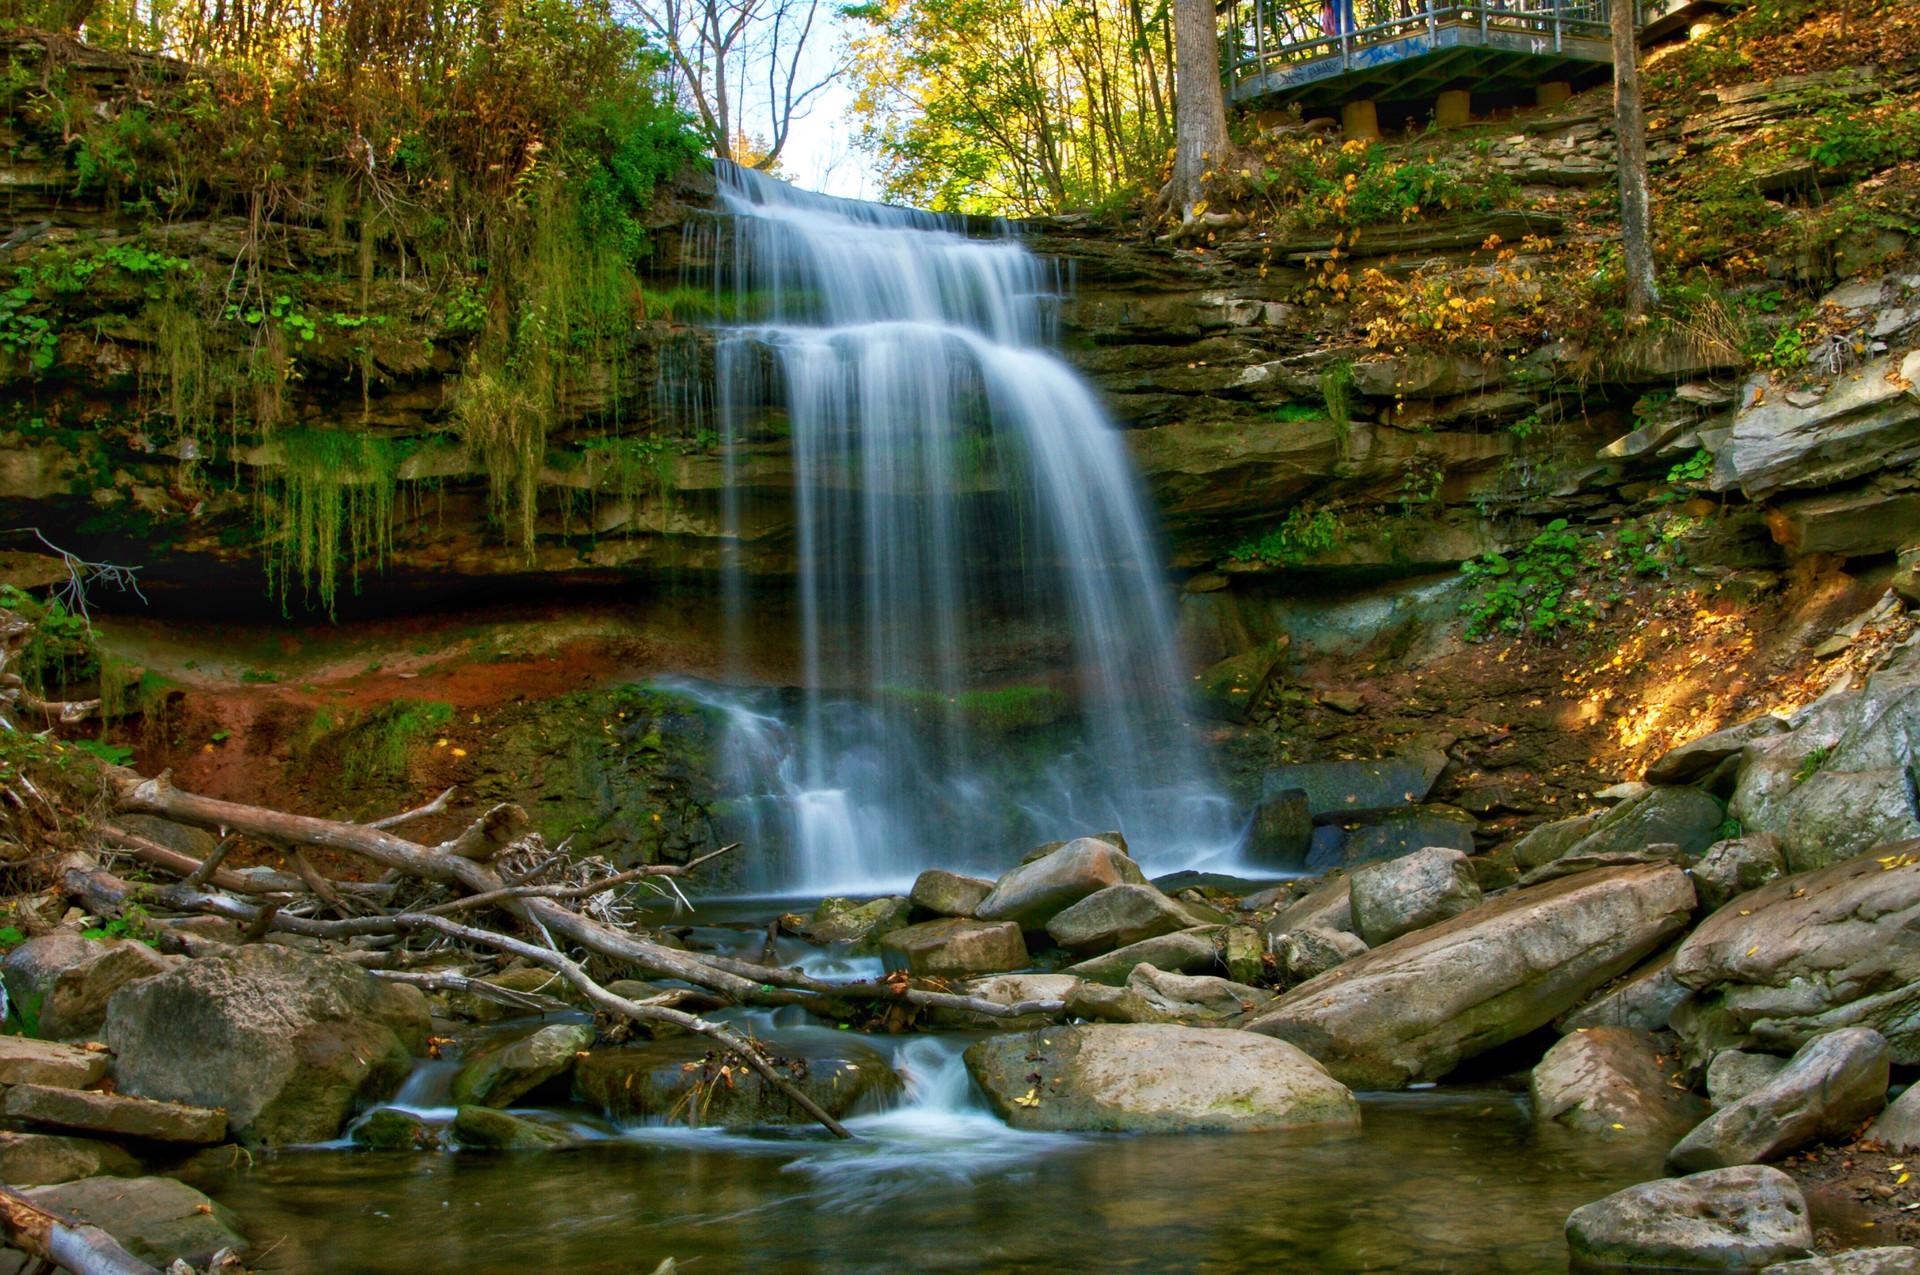 Smokey Hollows Waterfall in Waterdown, Ontario